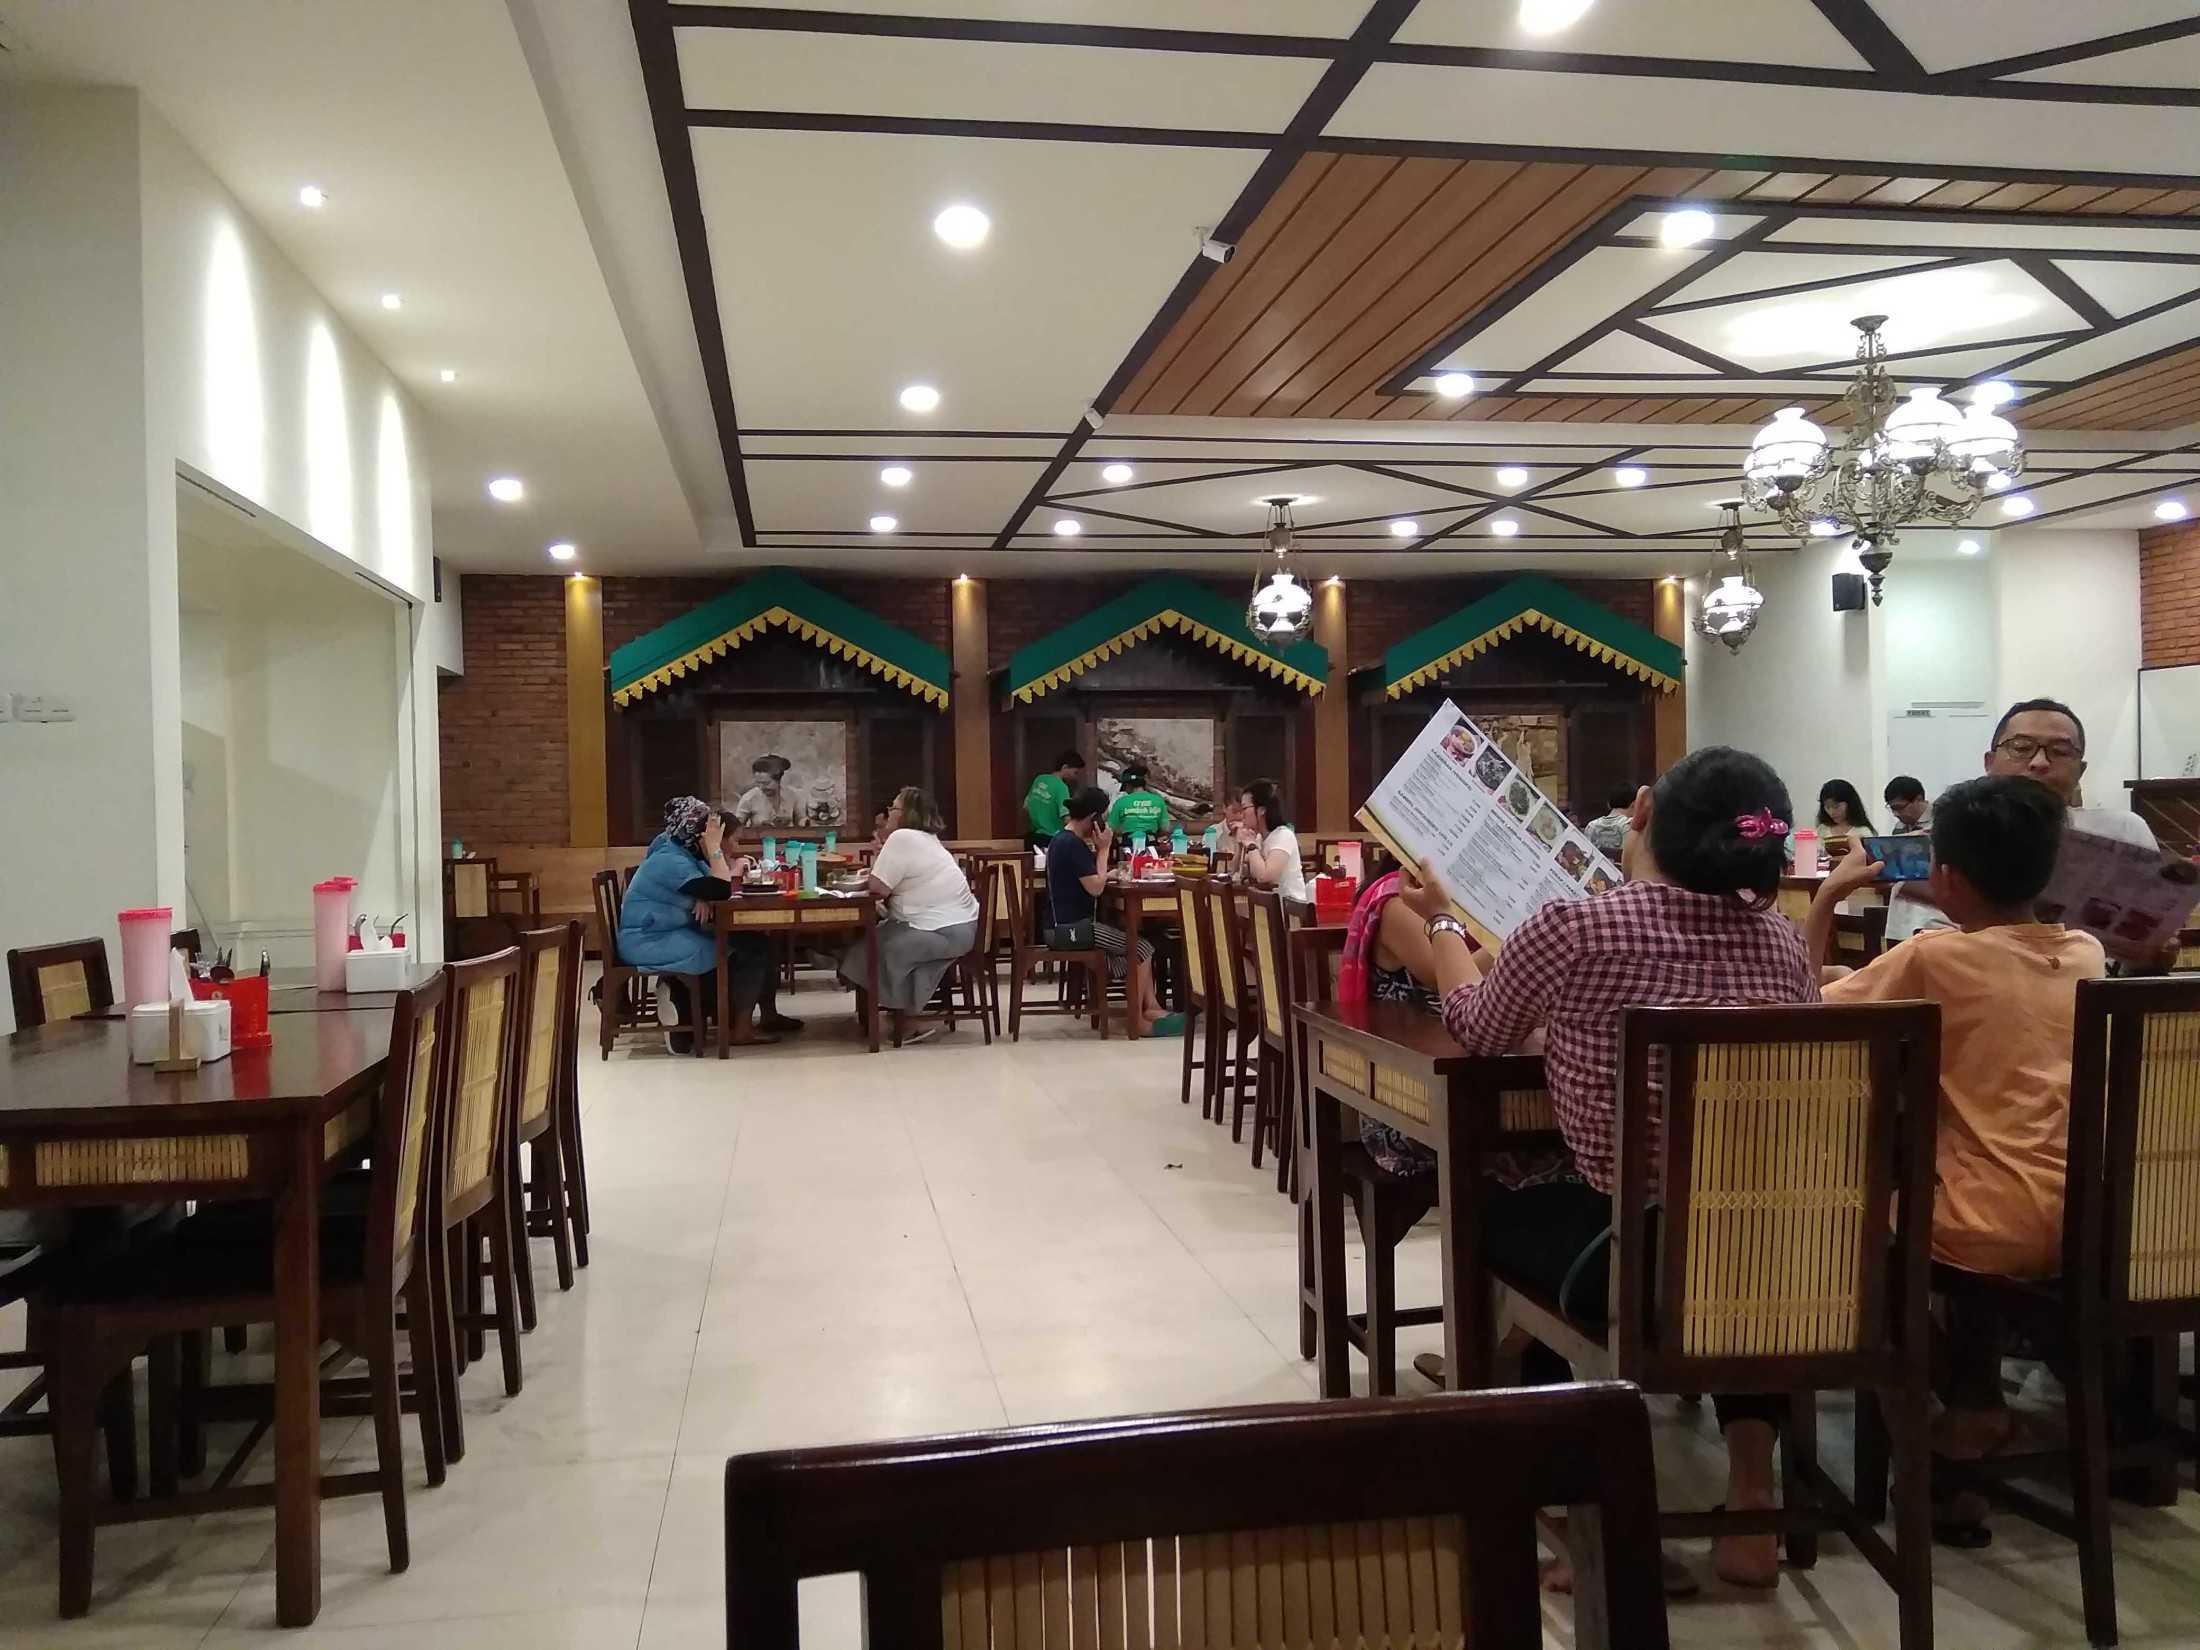 Roku+Architects Restaurant Lombok Idjo Renon Renon, Kec. Denpasar Sel., Kota Denpasar, Bali, Indonesia Renon, Kec. Denpasar Sel., Kota Denpasar, Bali, Indonesia Rokuarchitects-Restaurant-Lombok-Idjo-Renon  115894